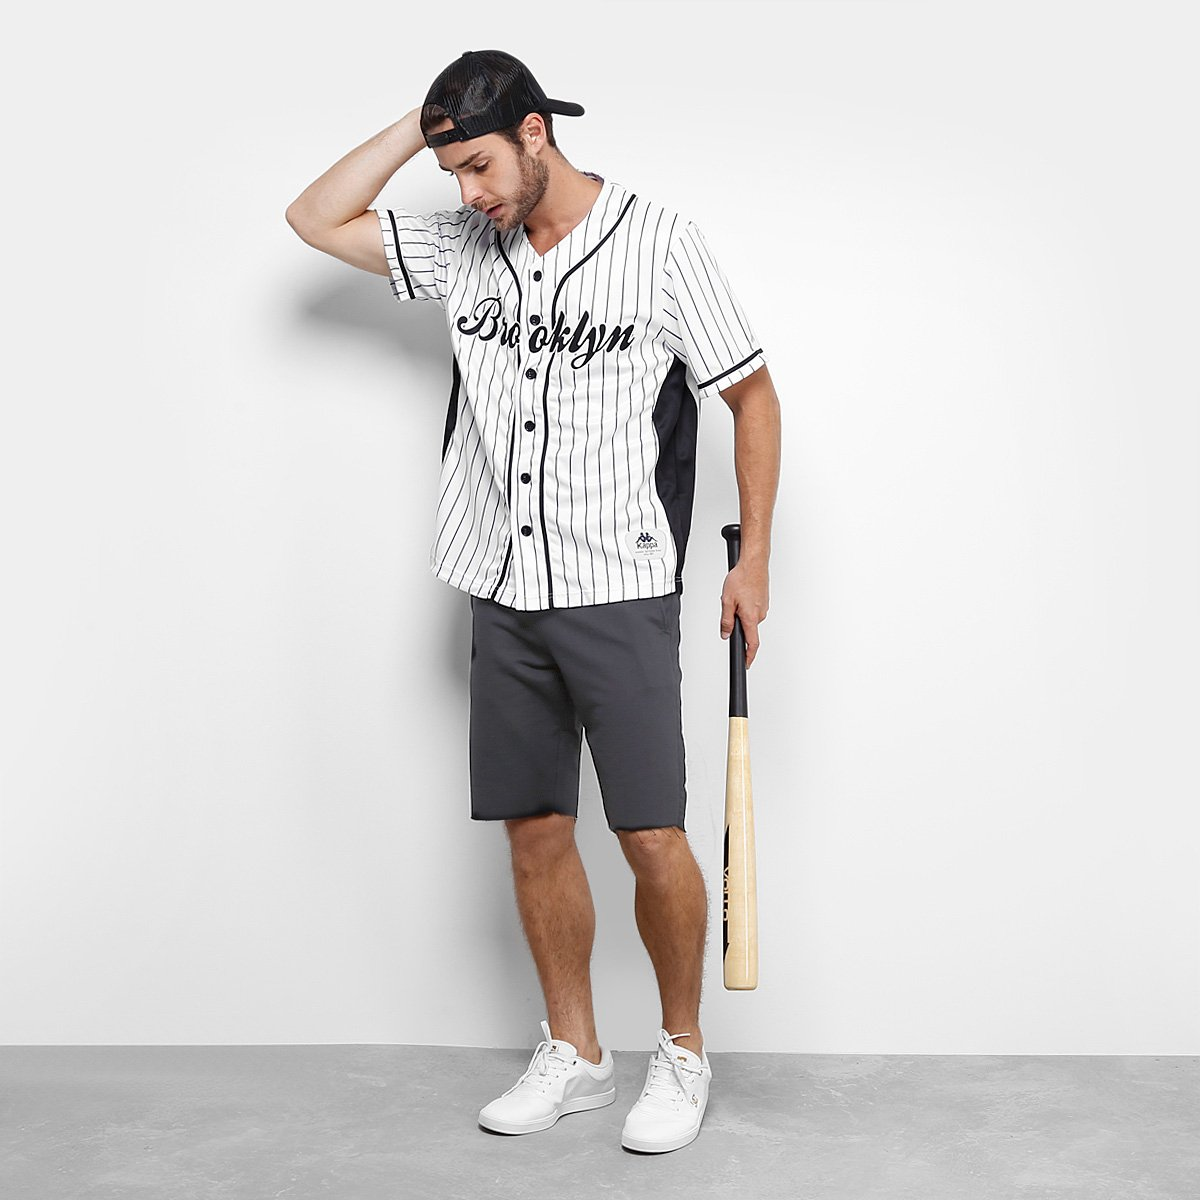 e74261f9d Camisa Baseball Kappa Brooklyn 17 Masculina - Branco e Preto